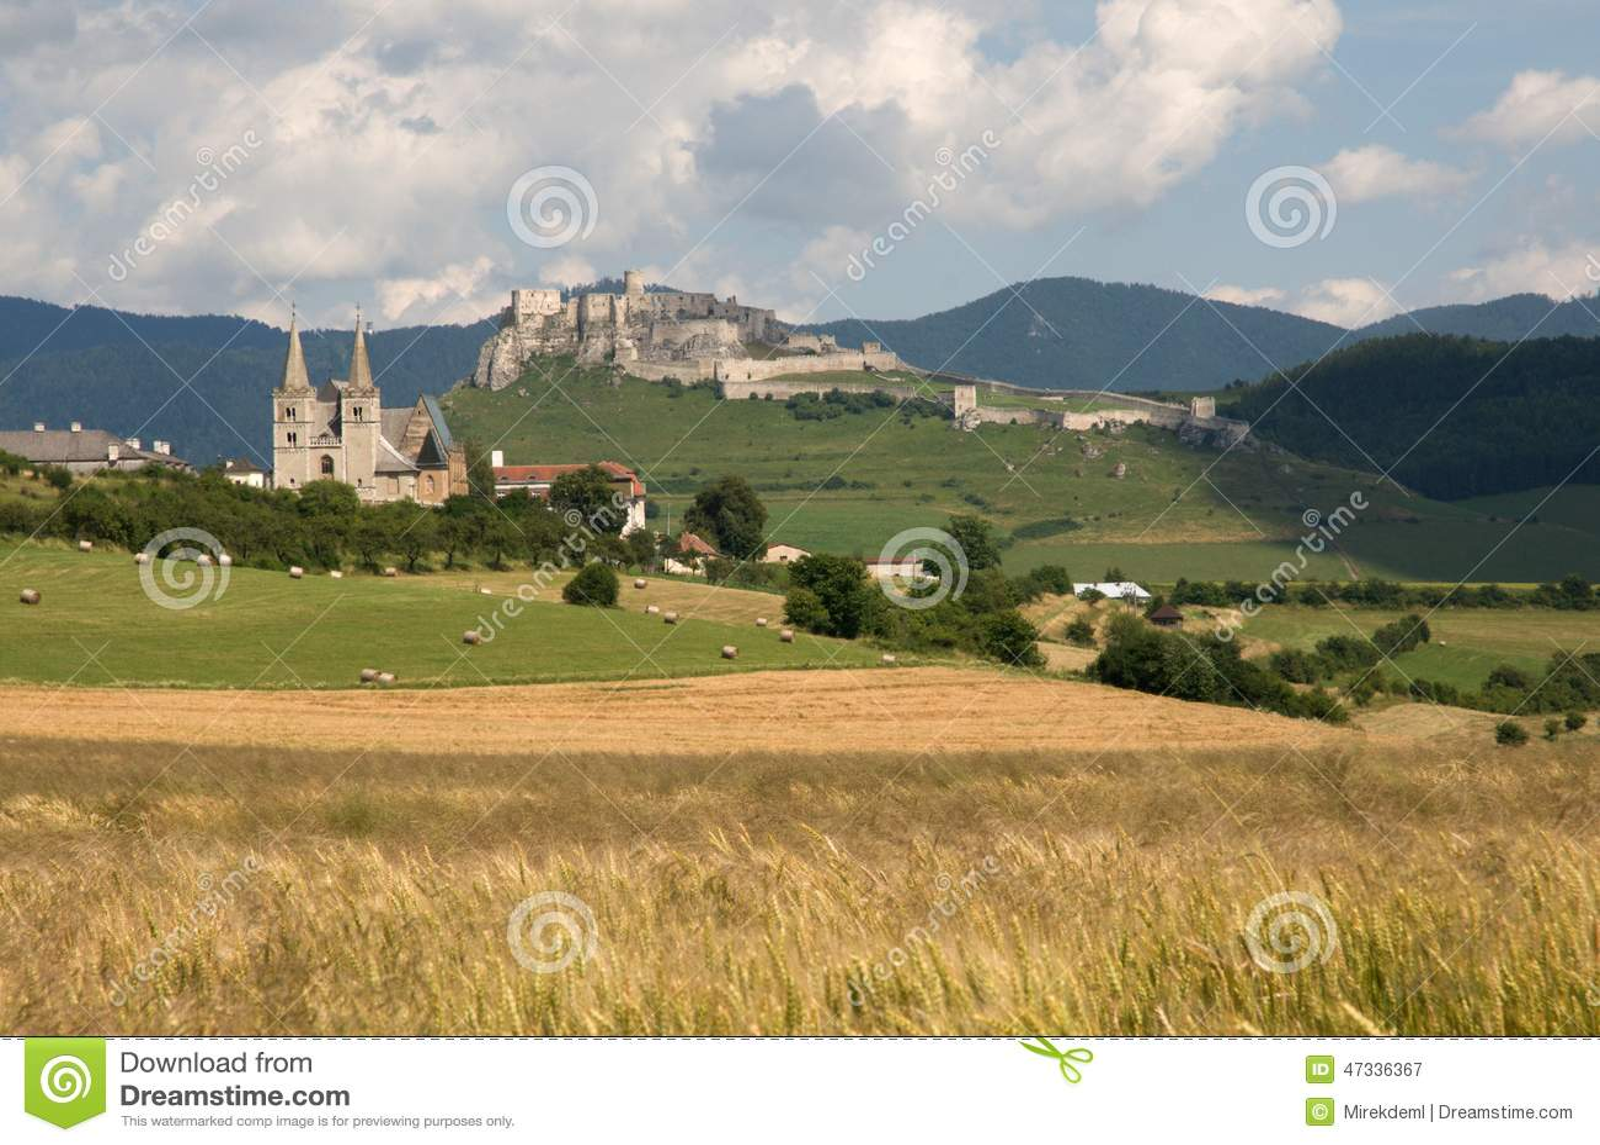 Spisska Kapitula and Spis castle, Slovakia